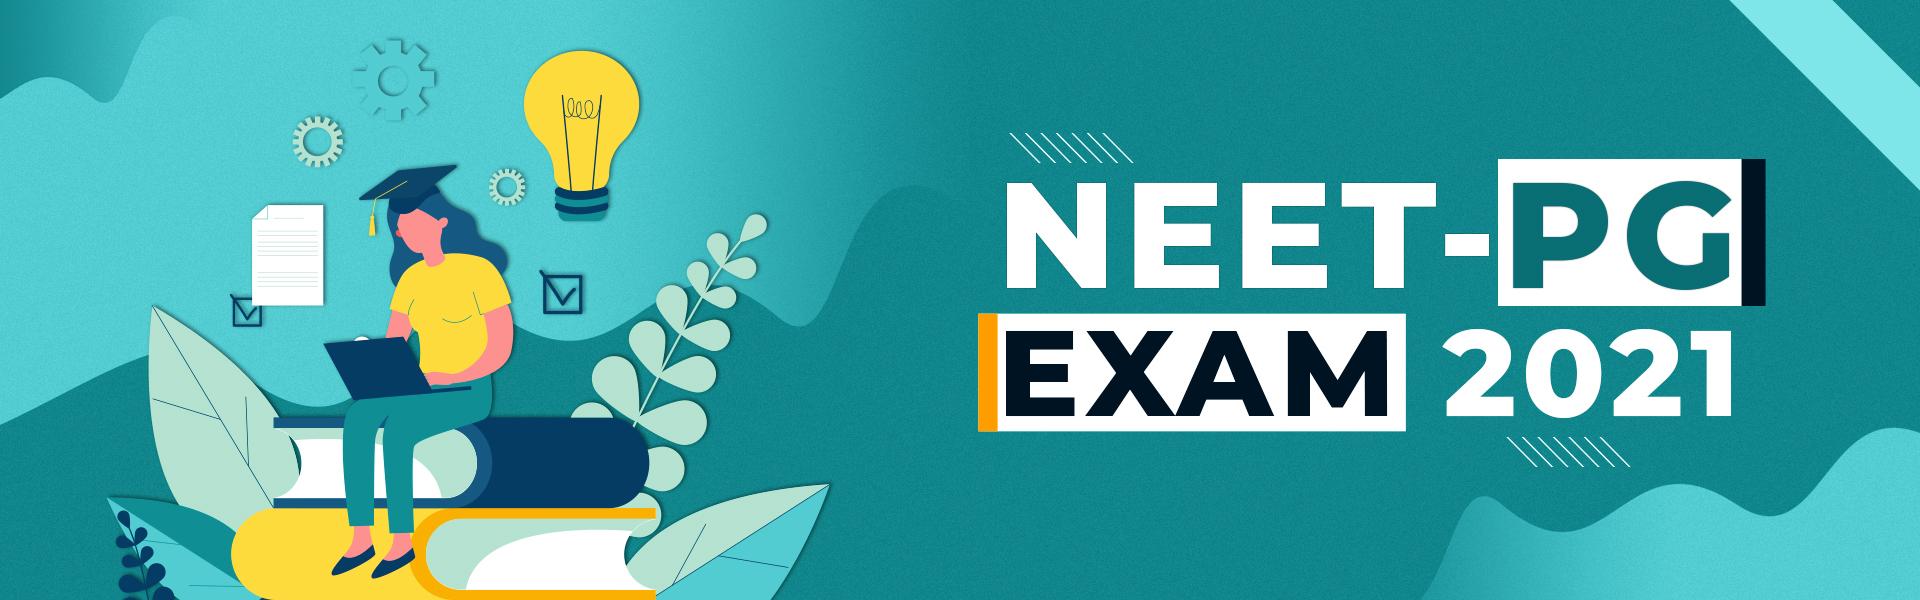 NEET PG Exam 2021